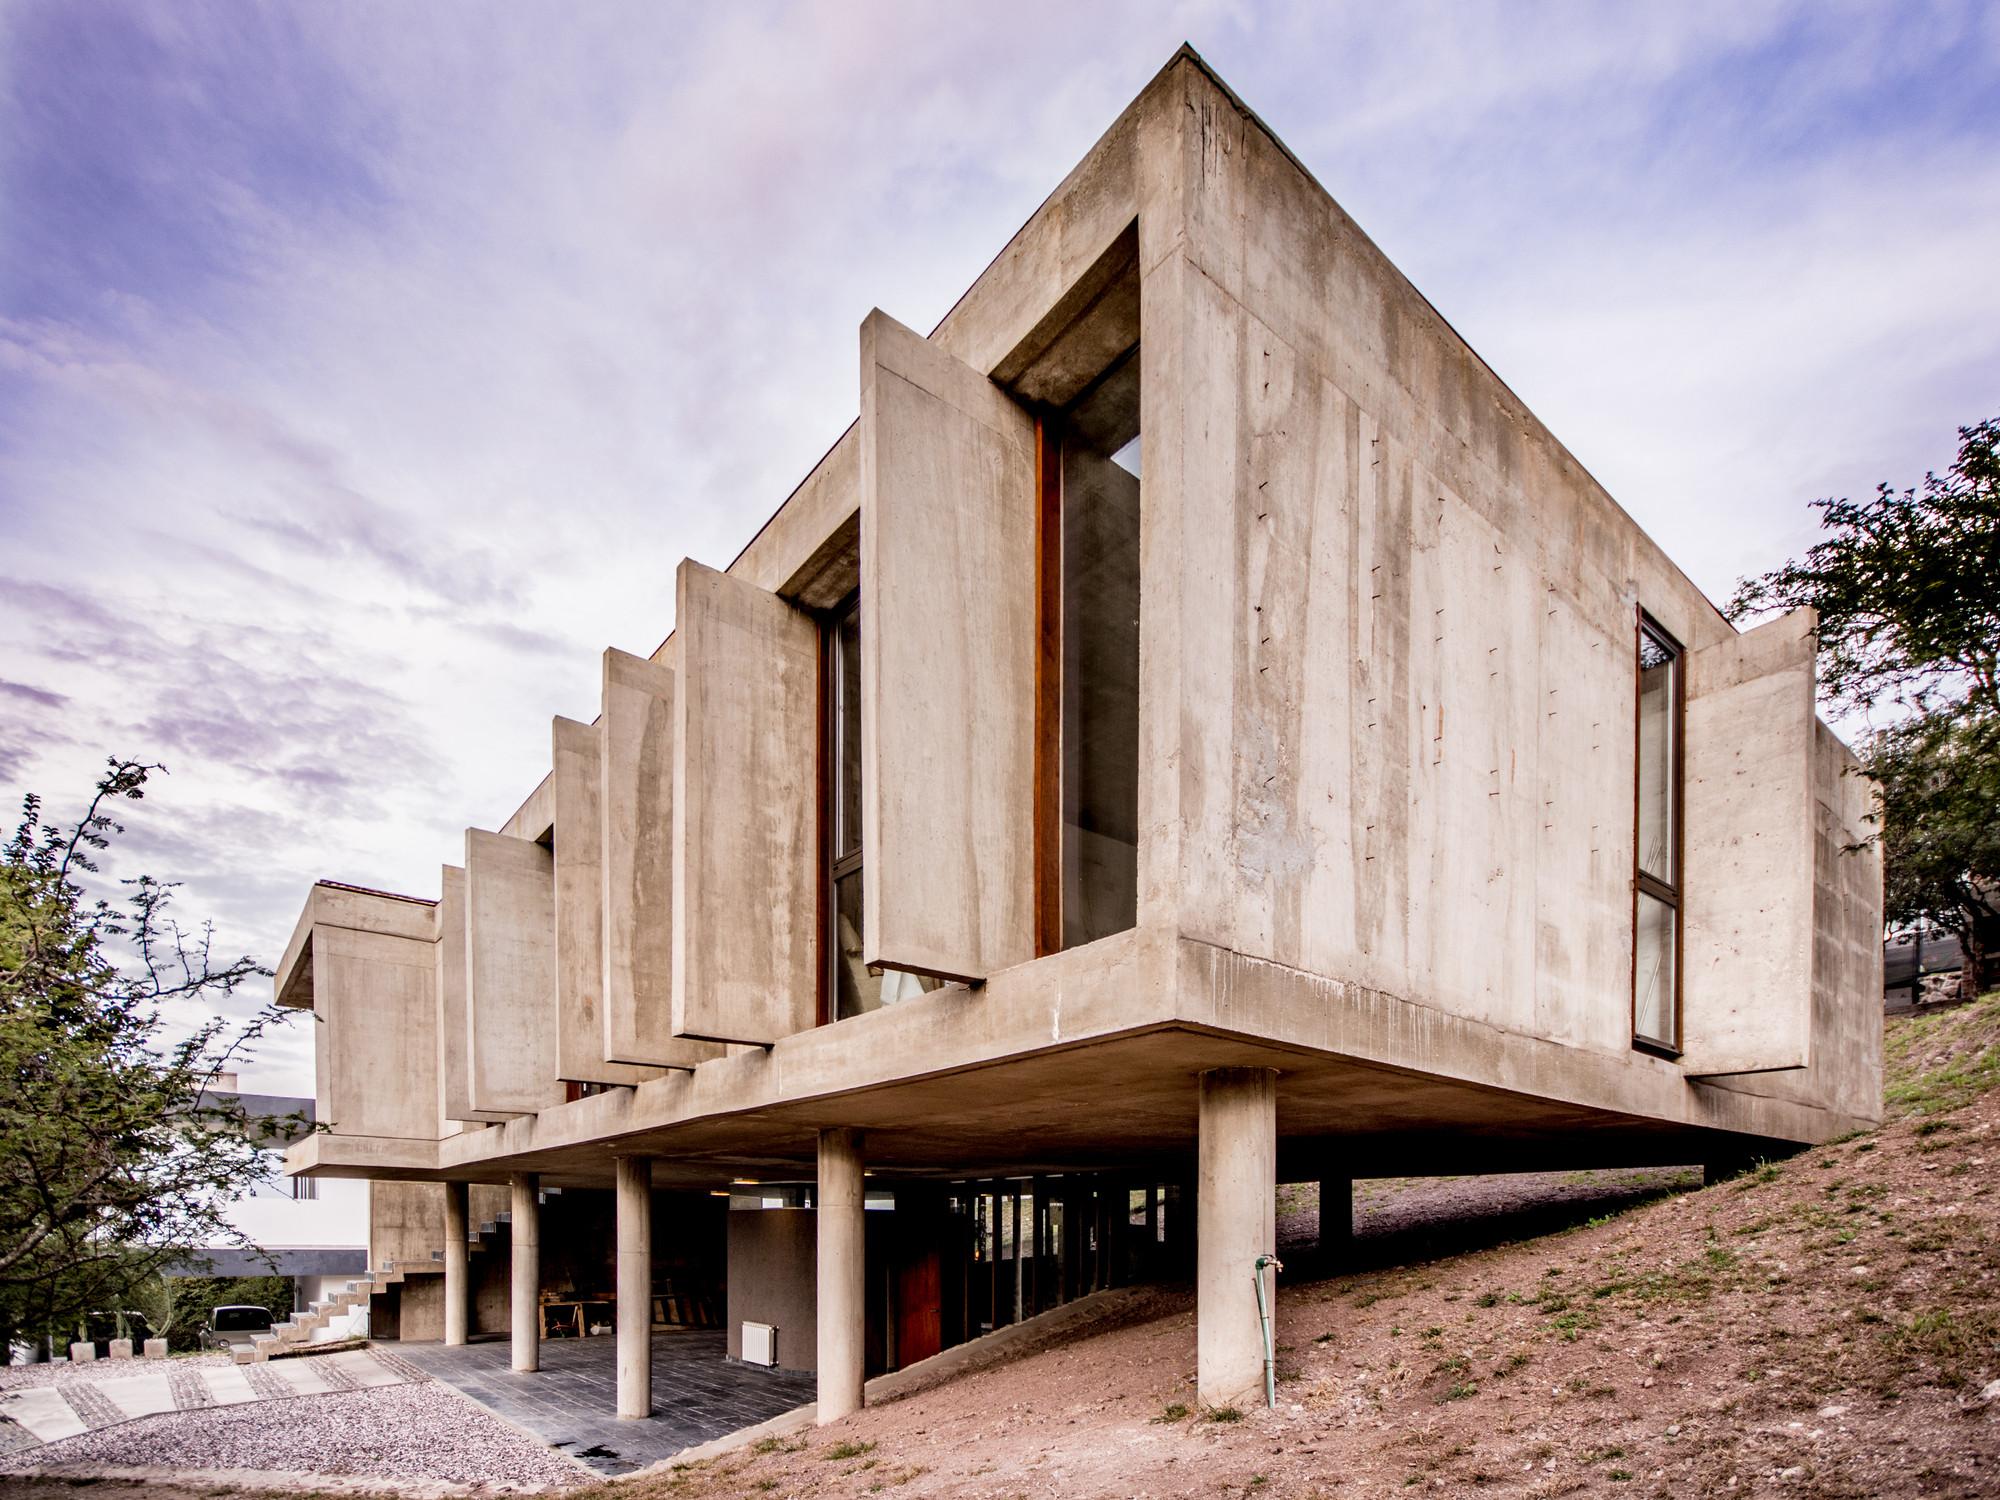 Casa em La Rufina / Santiago Carlos Viale + Daniella Beviglia, © Gonzalo Viramonte